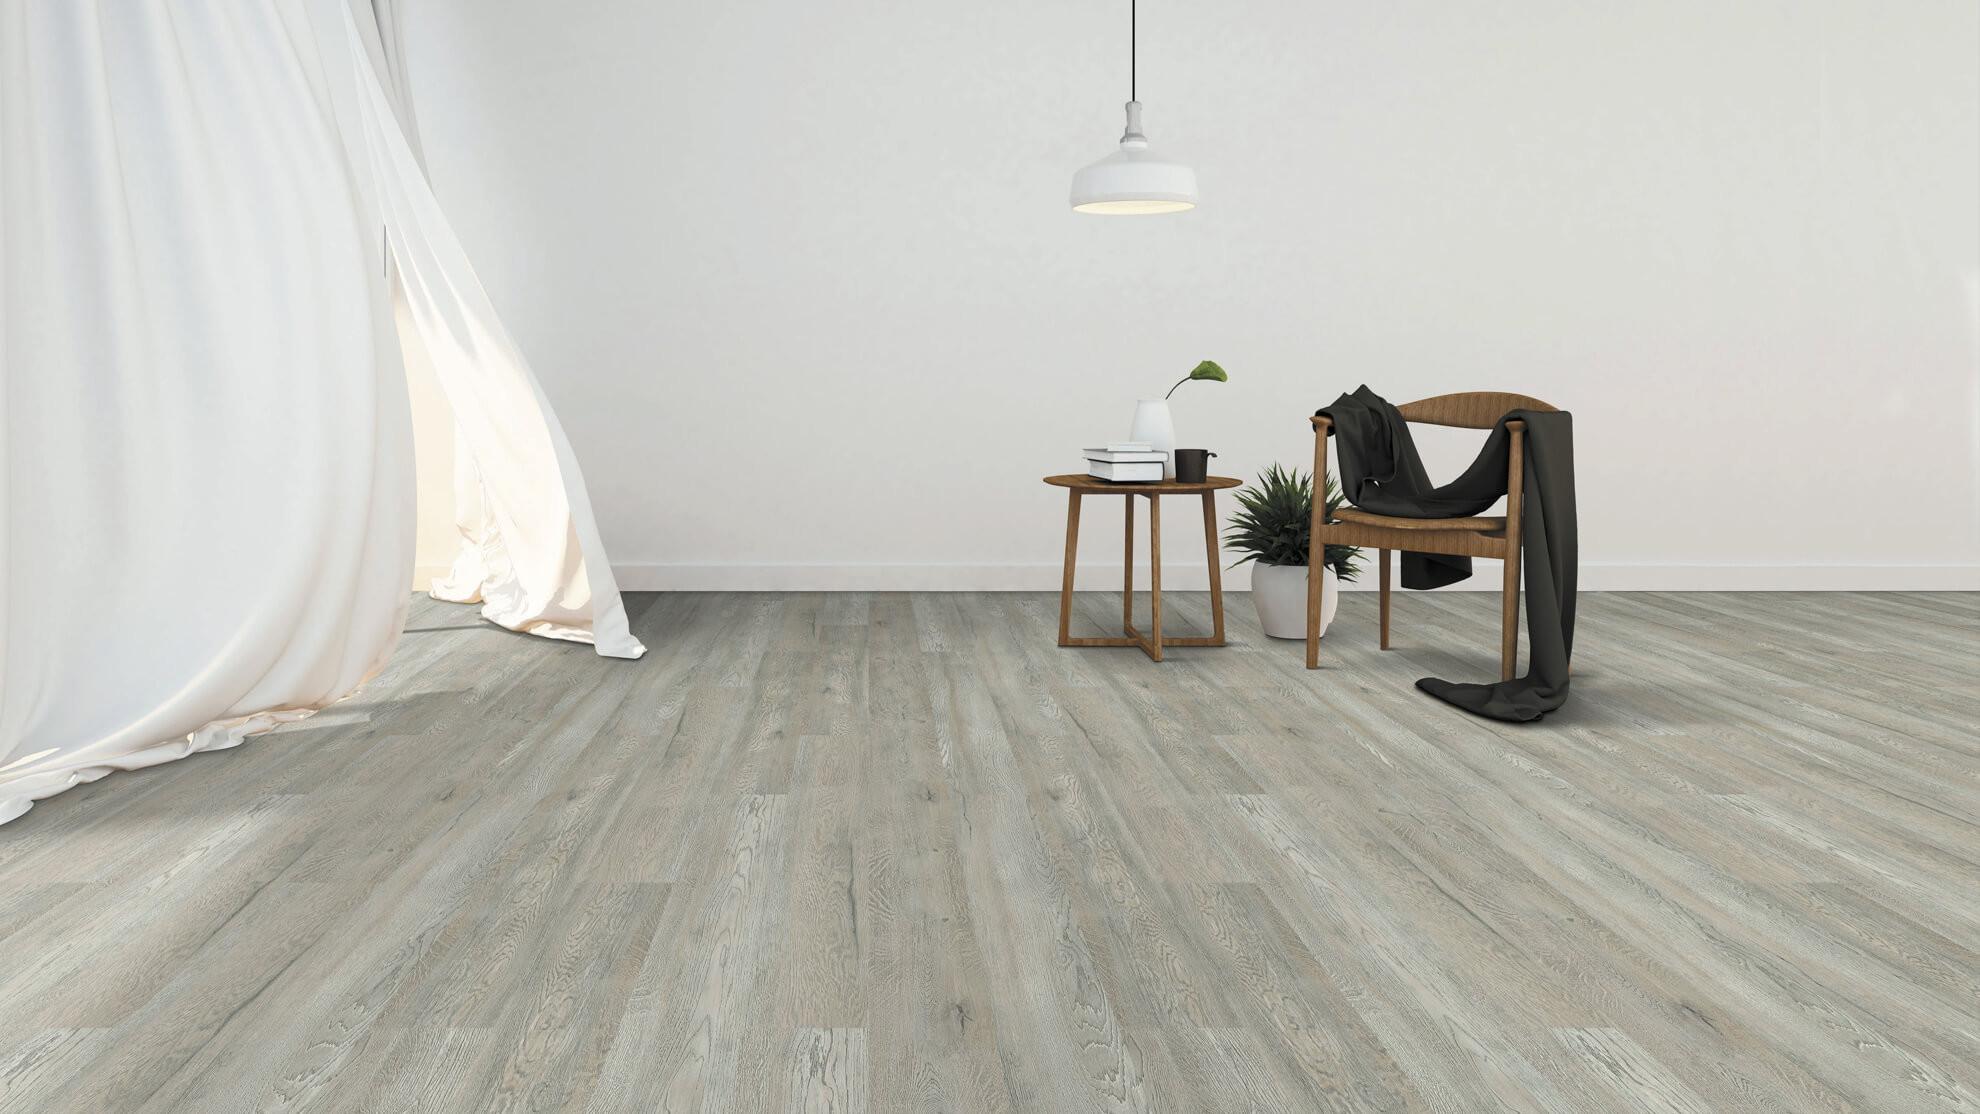 16 Awesome Texas Hardwood Flooring Reviews 2021 free download texas hardwood flooring reviews of earthwerks flooring with noble classic plus alaska oak ncr 9708